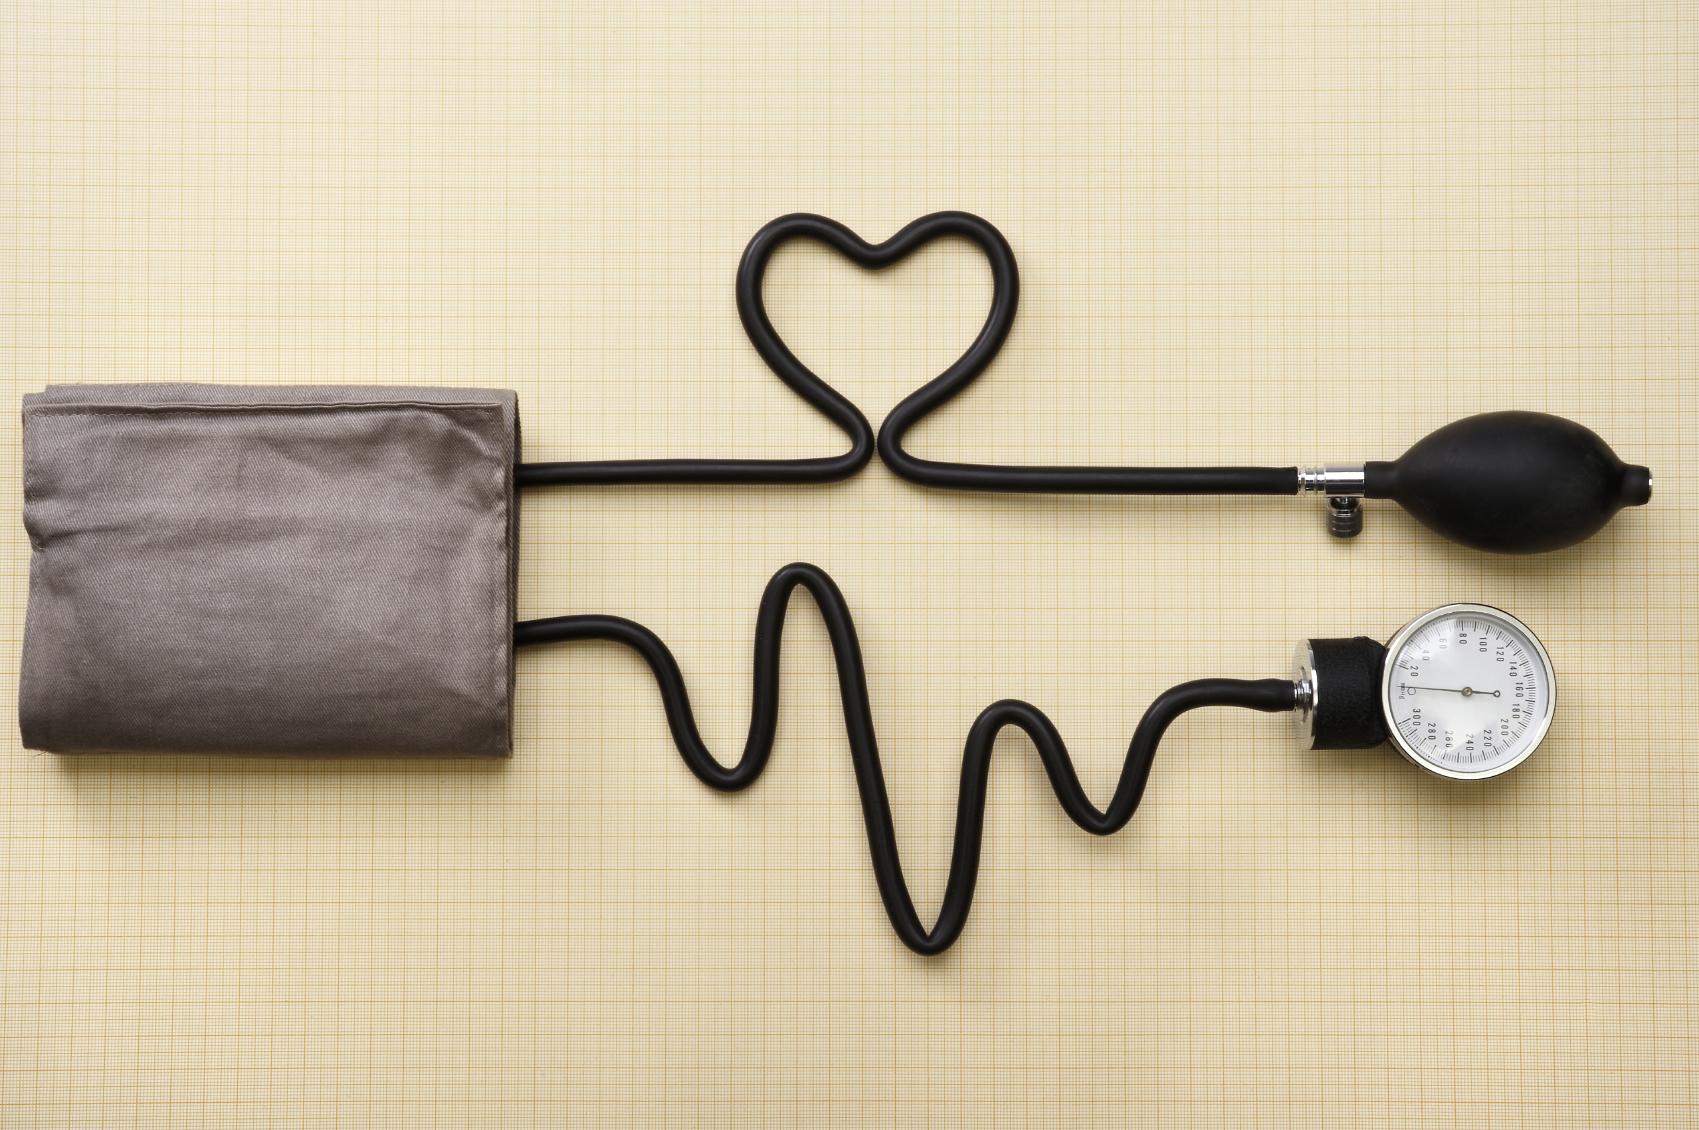 Feijoa-to-maintain-blood-pressure